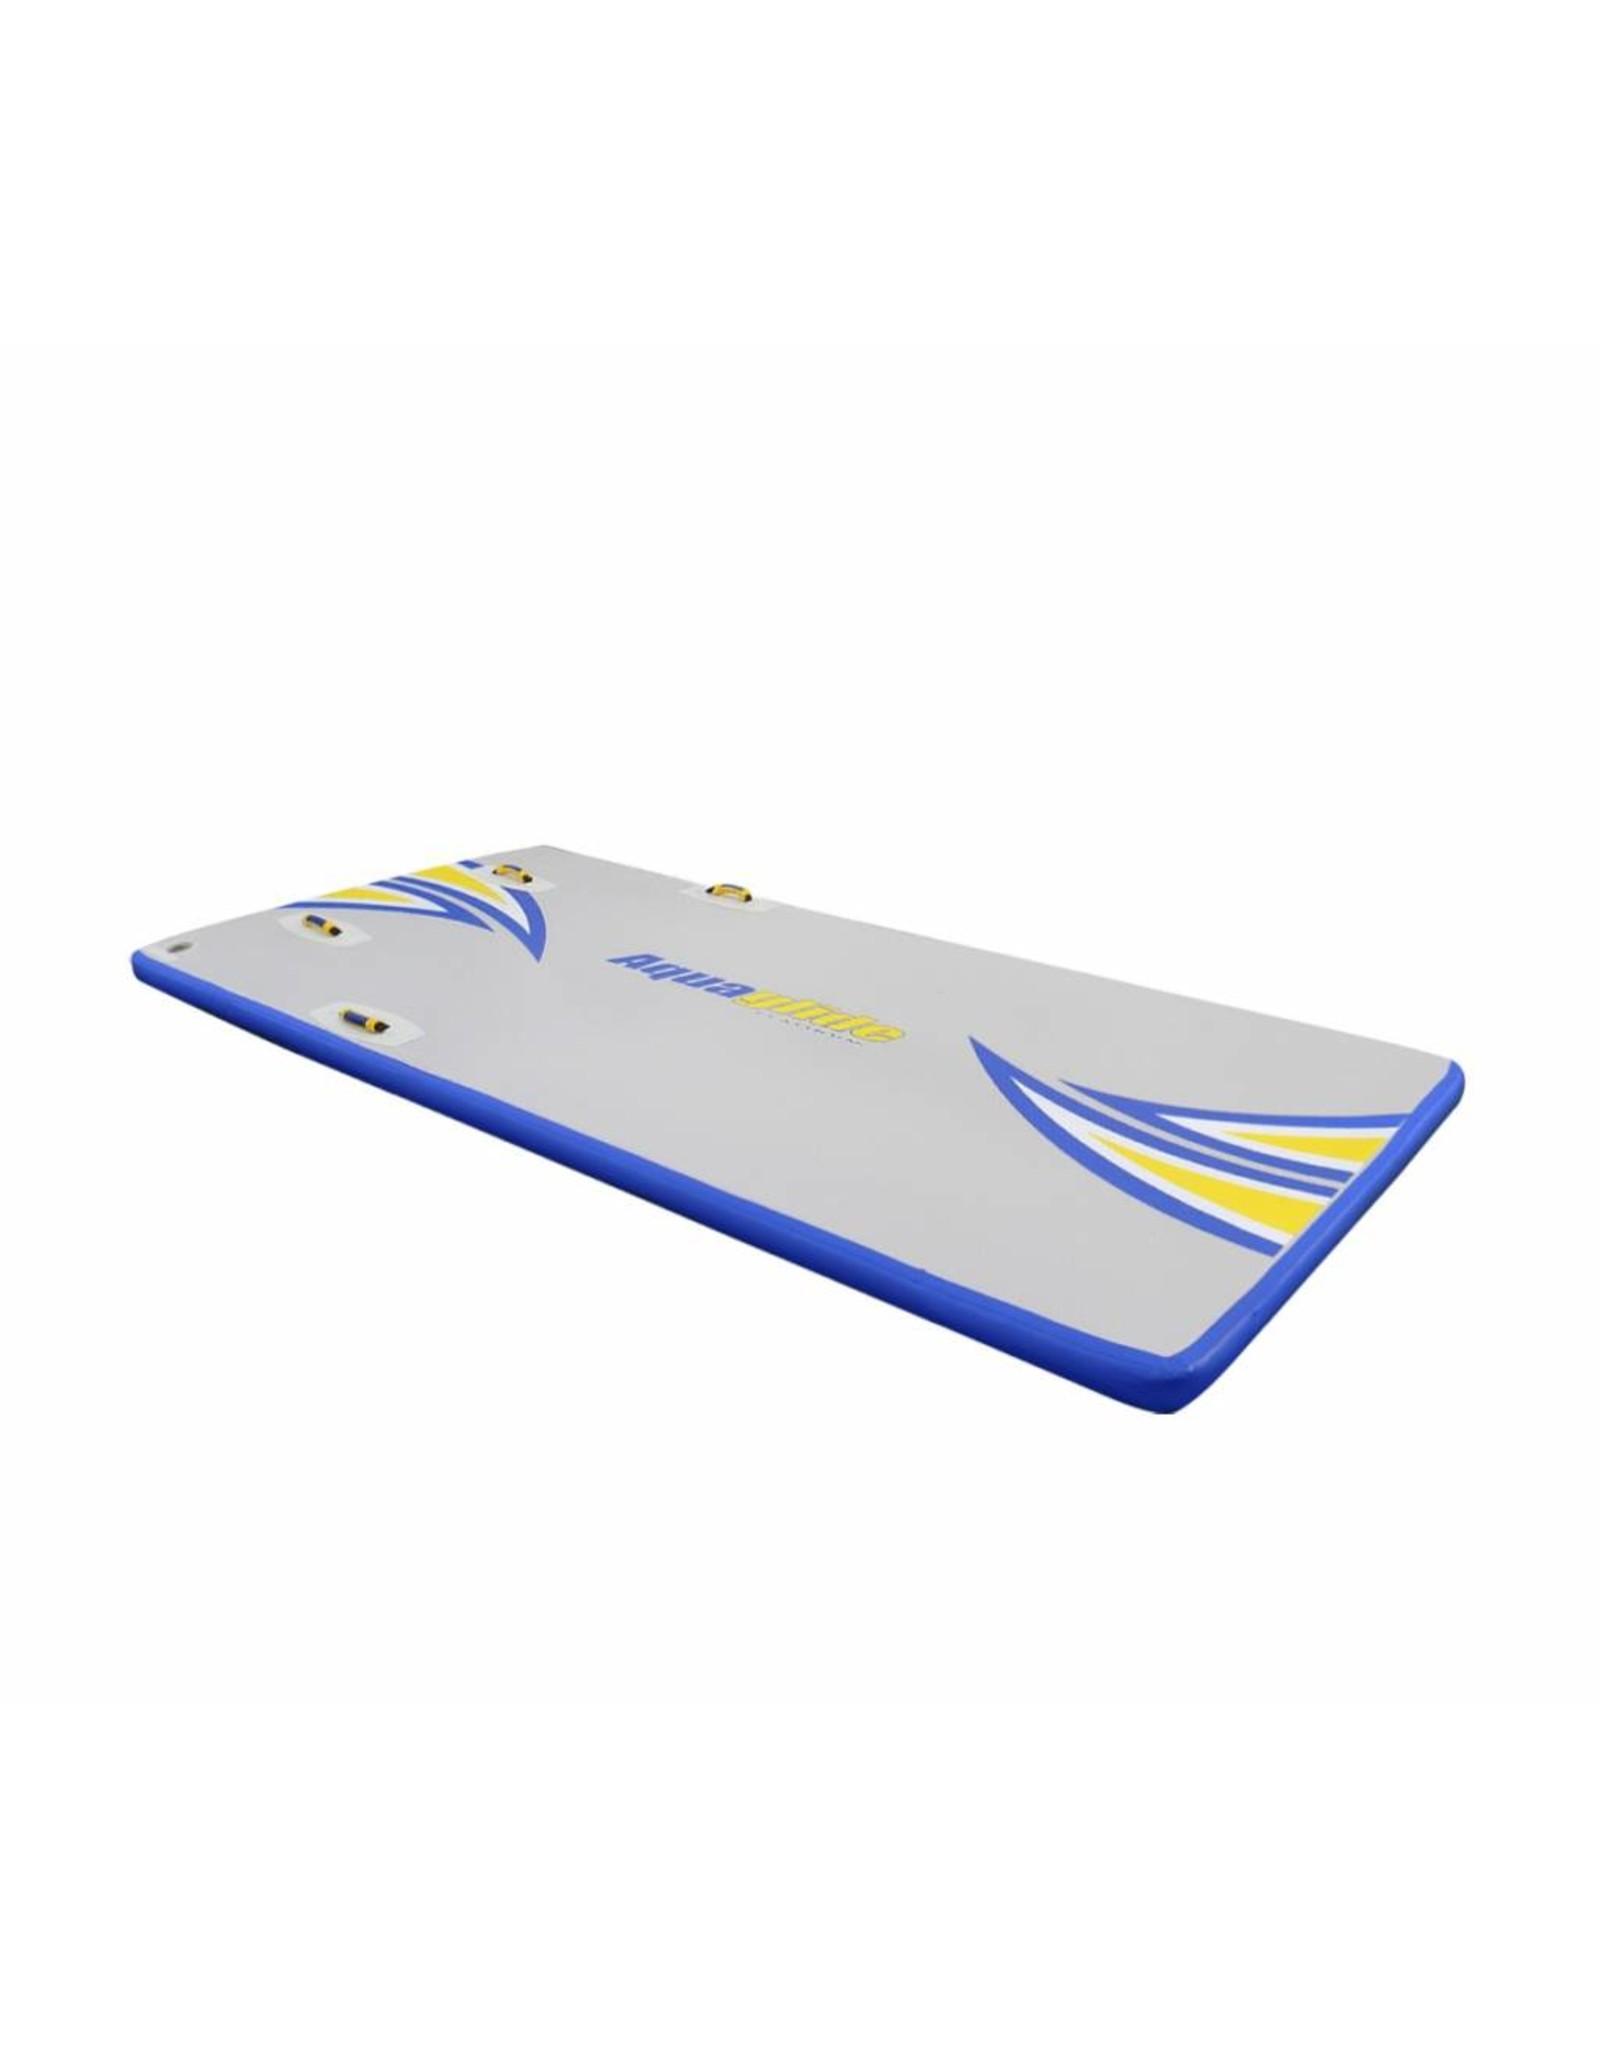 Aquaglide Runway HD 10'